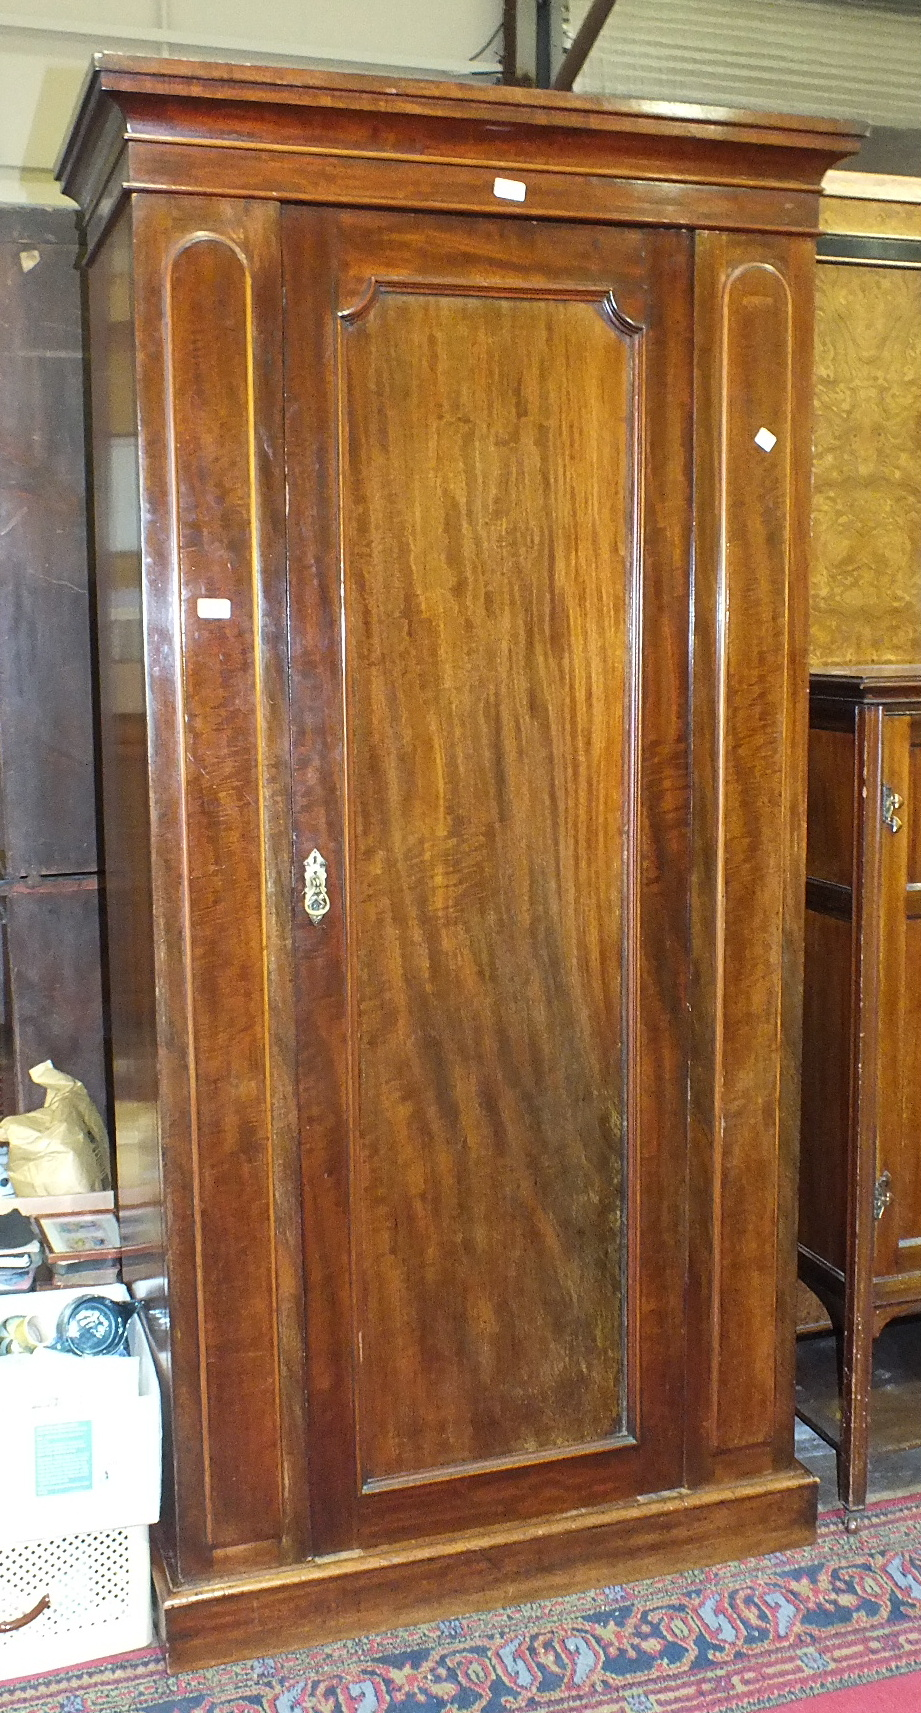 Lot 11 - A late-19th/early-20th century mahogany wardrobe, the cornice above a single door, on plinth base,